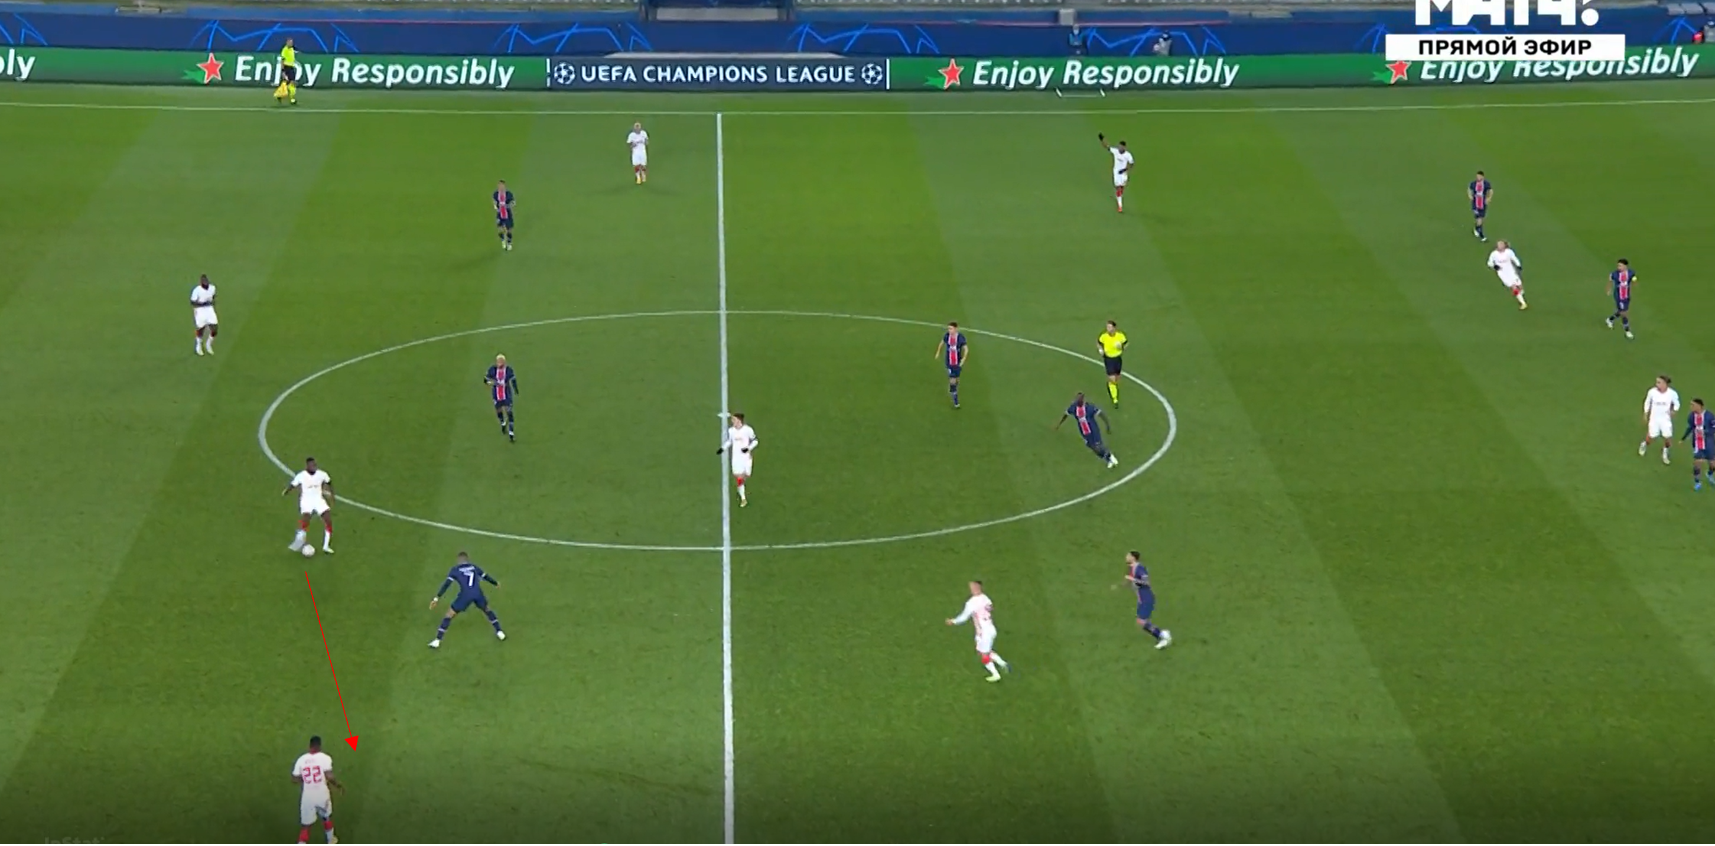 UEFA Champions League 2020/21: PSG vs RB Leipzig- tactical analysis tactics